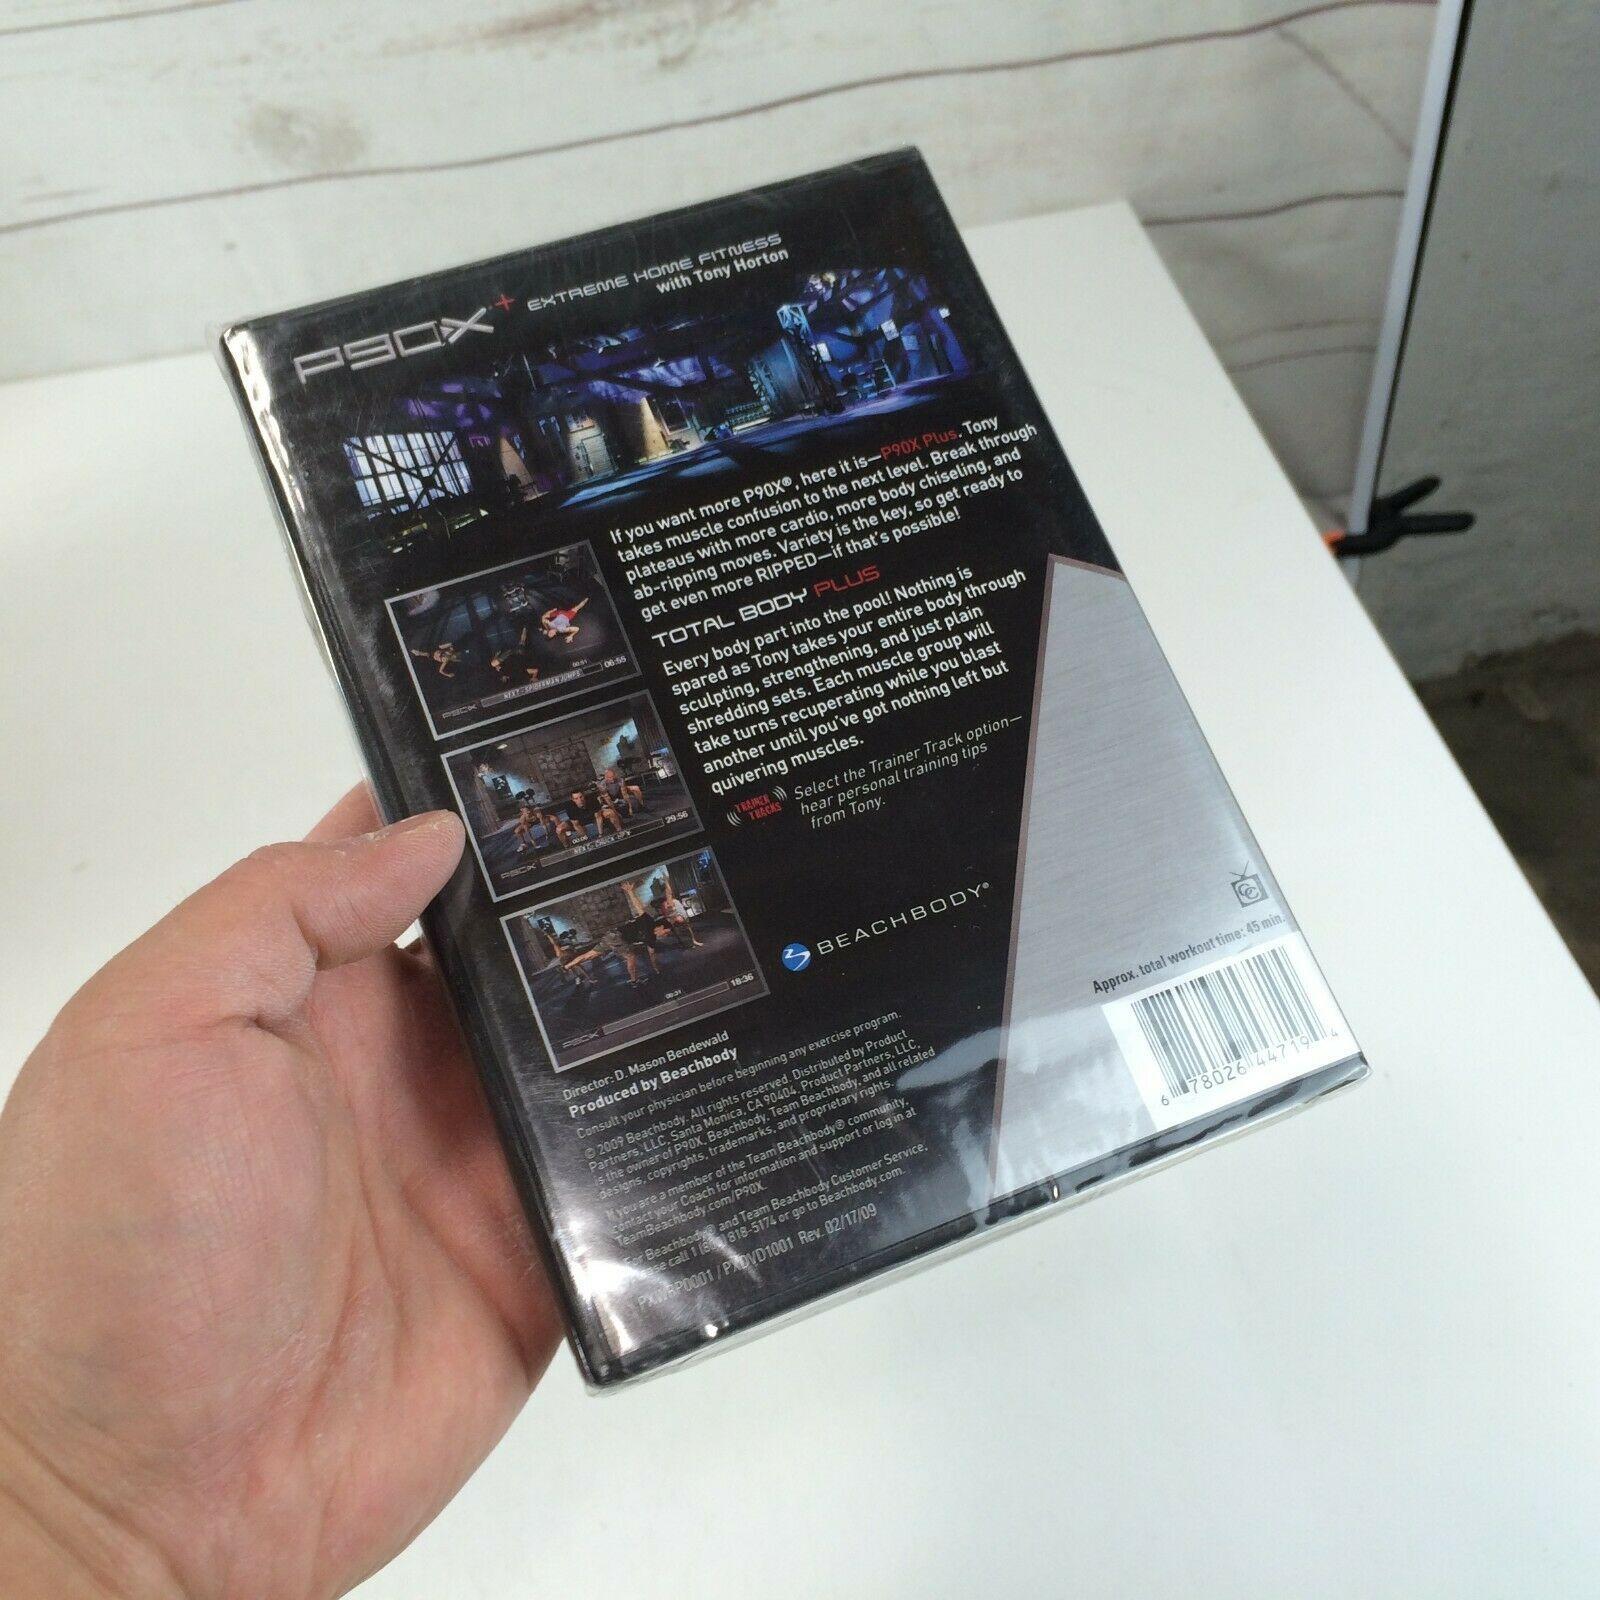 BEACHBODY P90X+ Extreme Home Fitness Total Body Plus with Tony Horton DVD NEW image 3